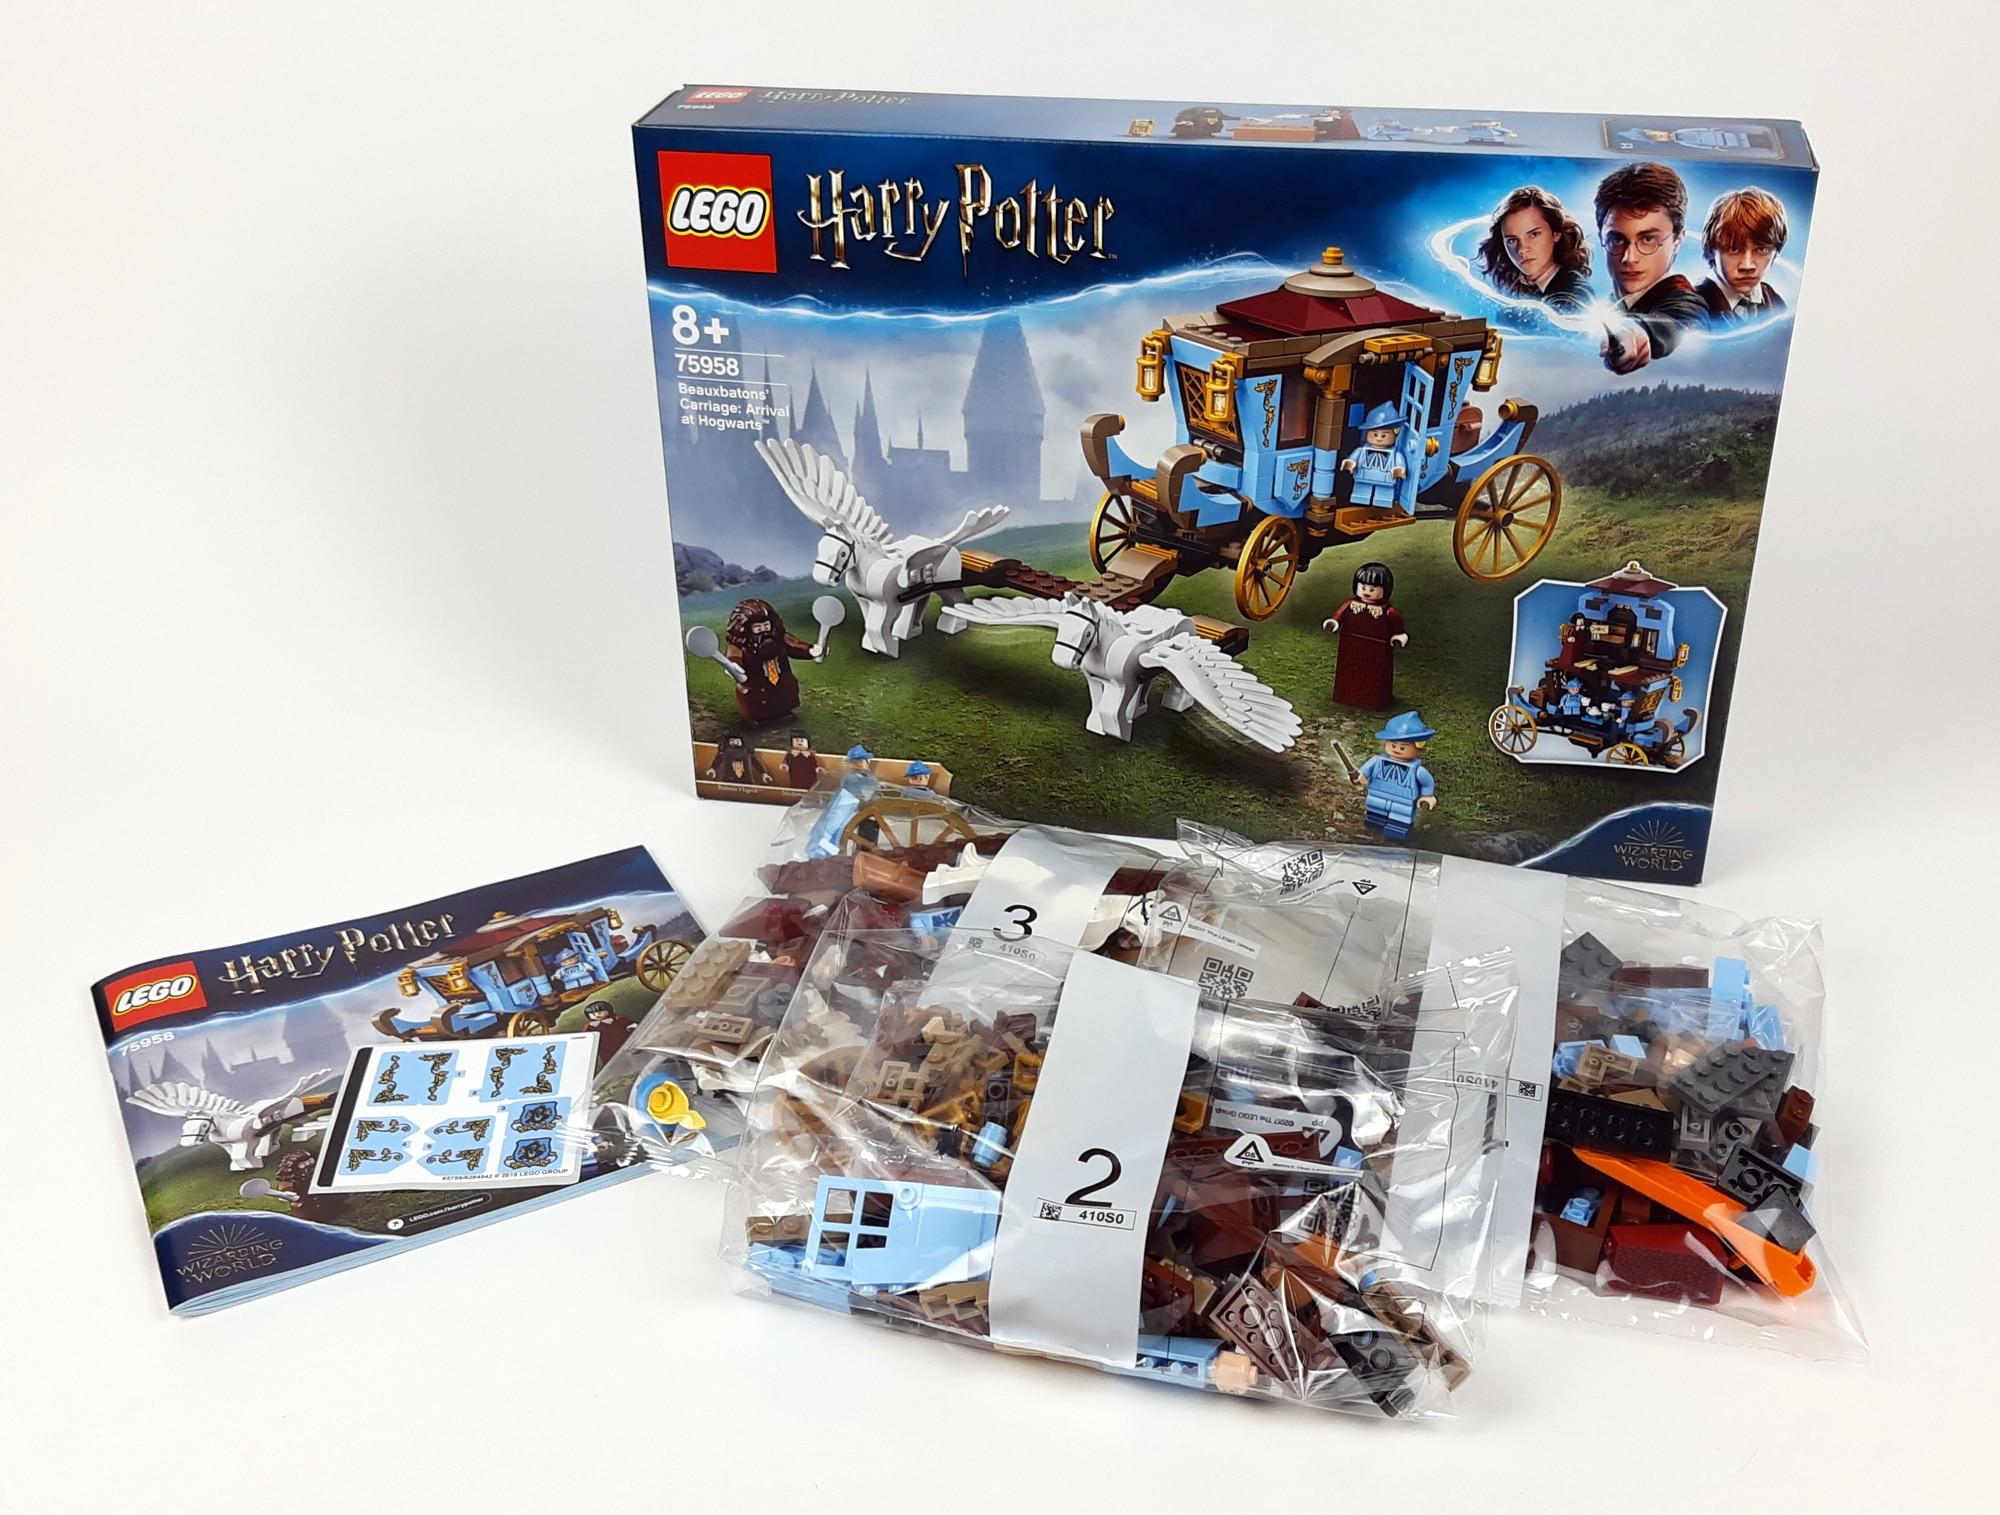 LEGO 75958 Harry Potter Beauxbatons Kutsche Box Und Inhalt